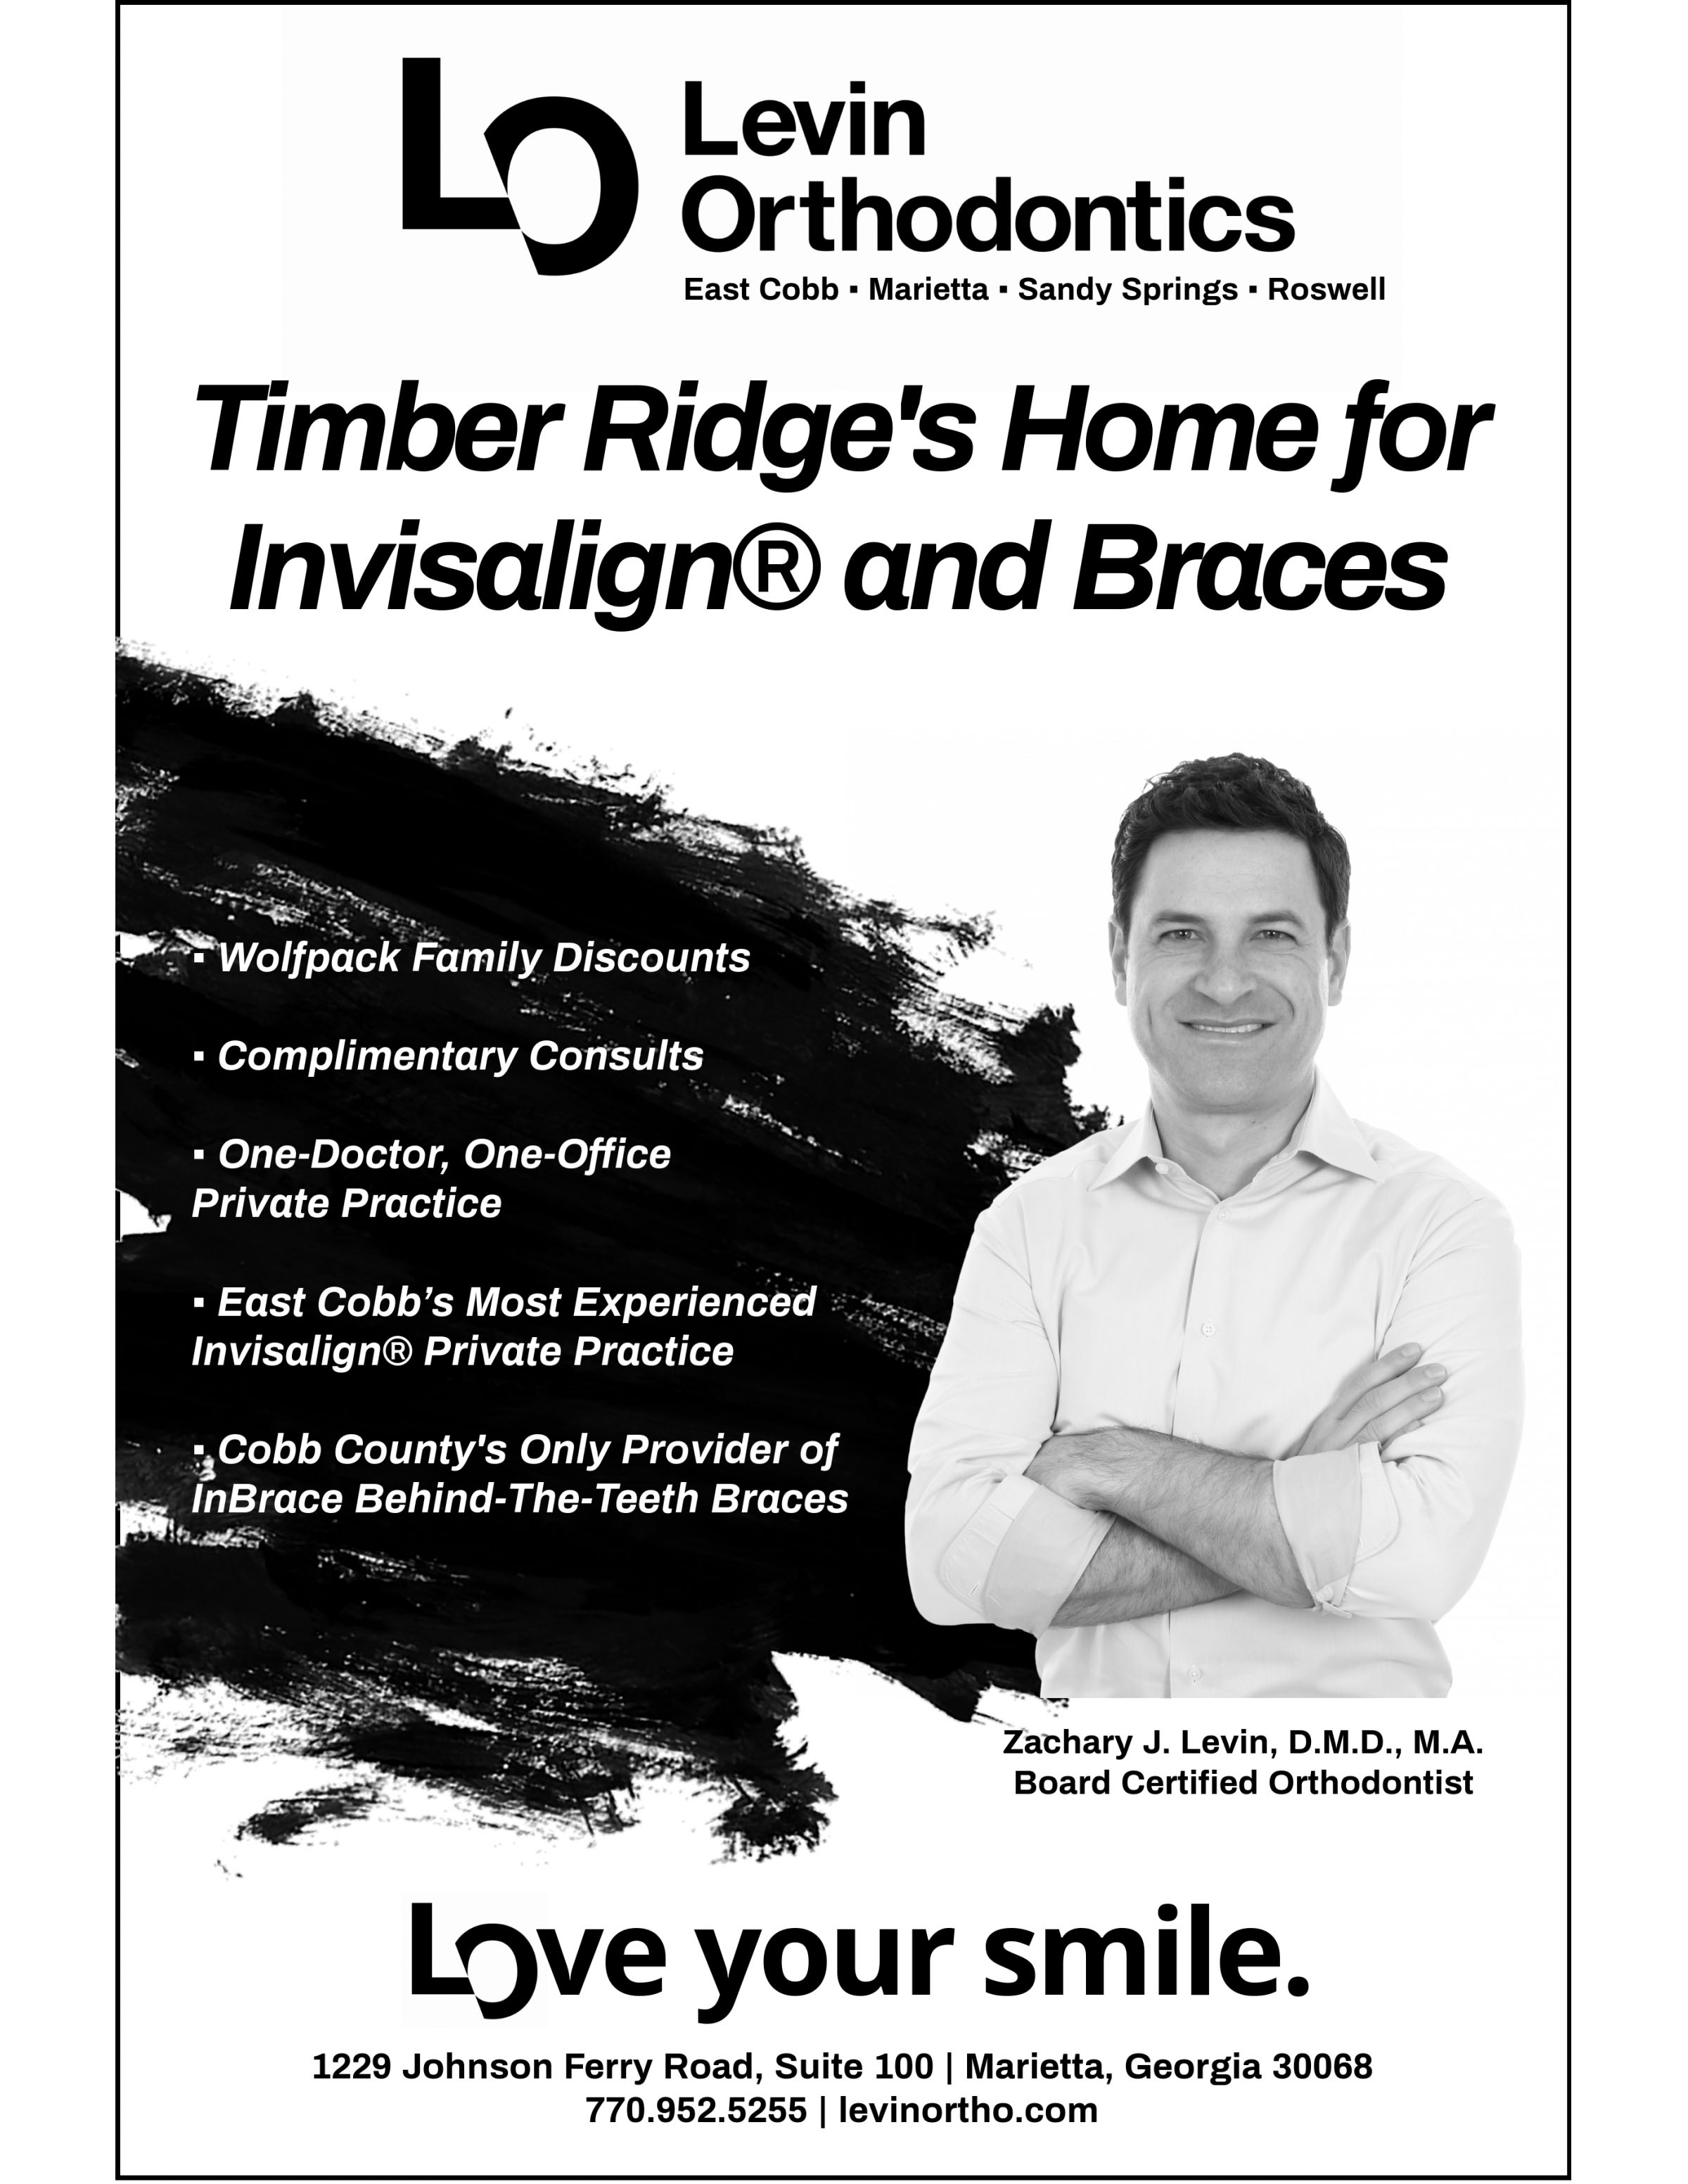 Levin Orthodontics Black Friday Sale Flyer Template (3)